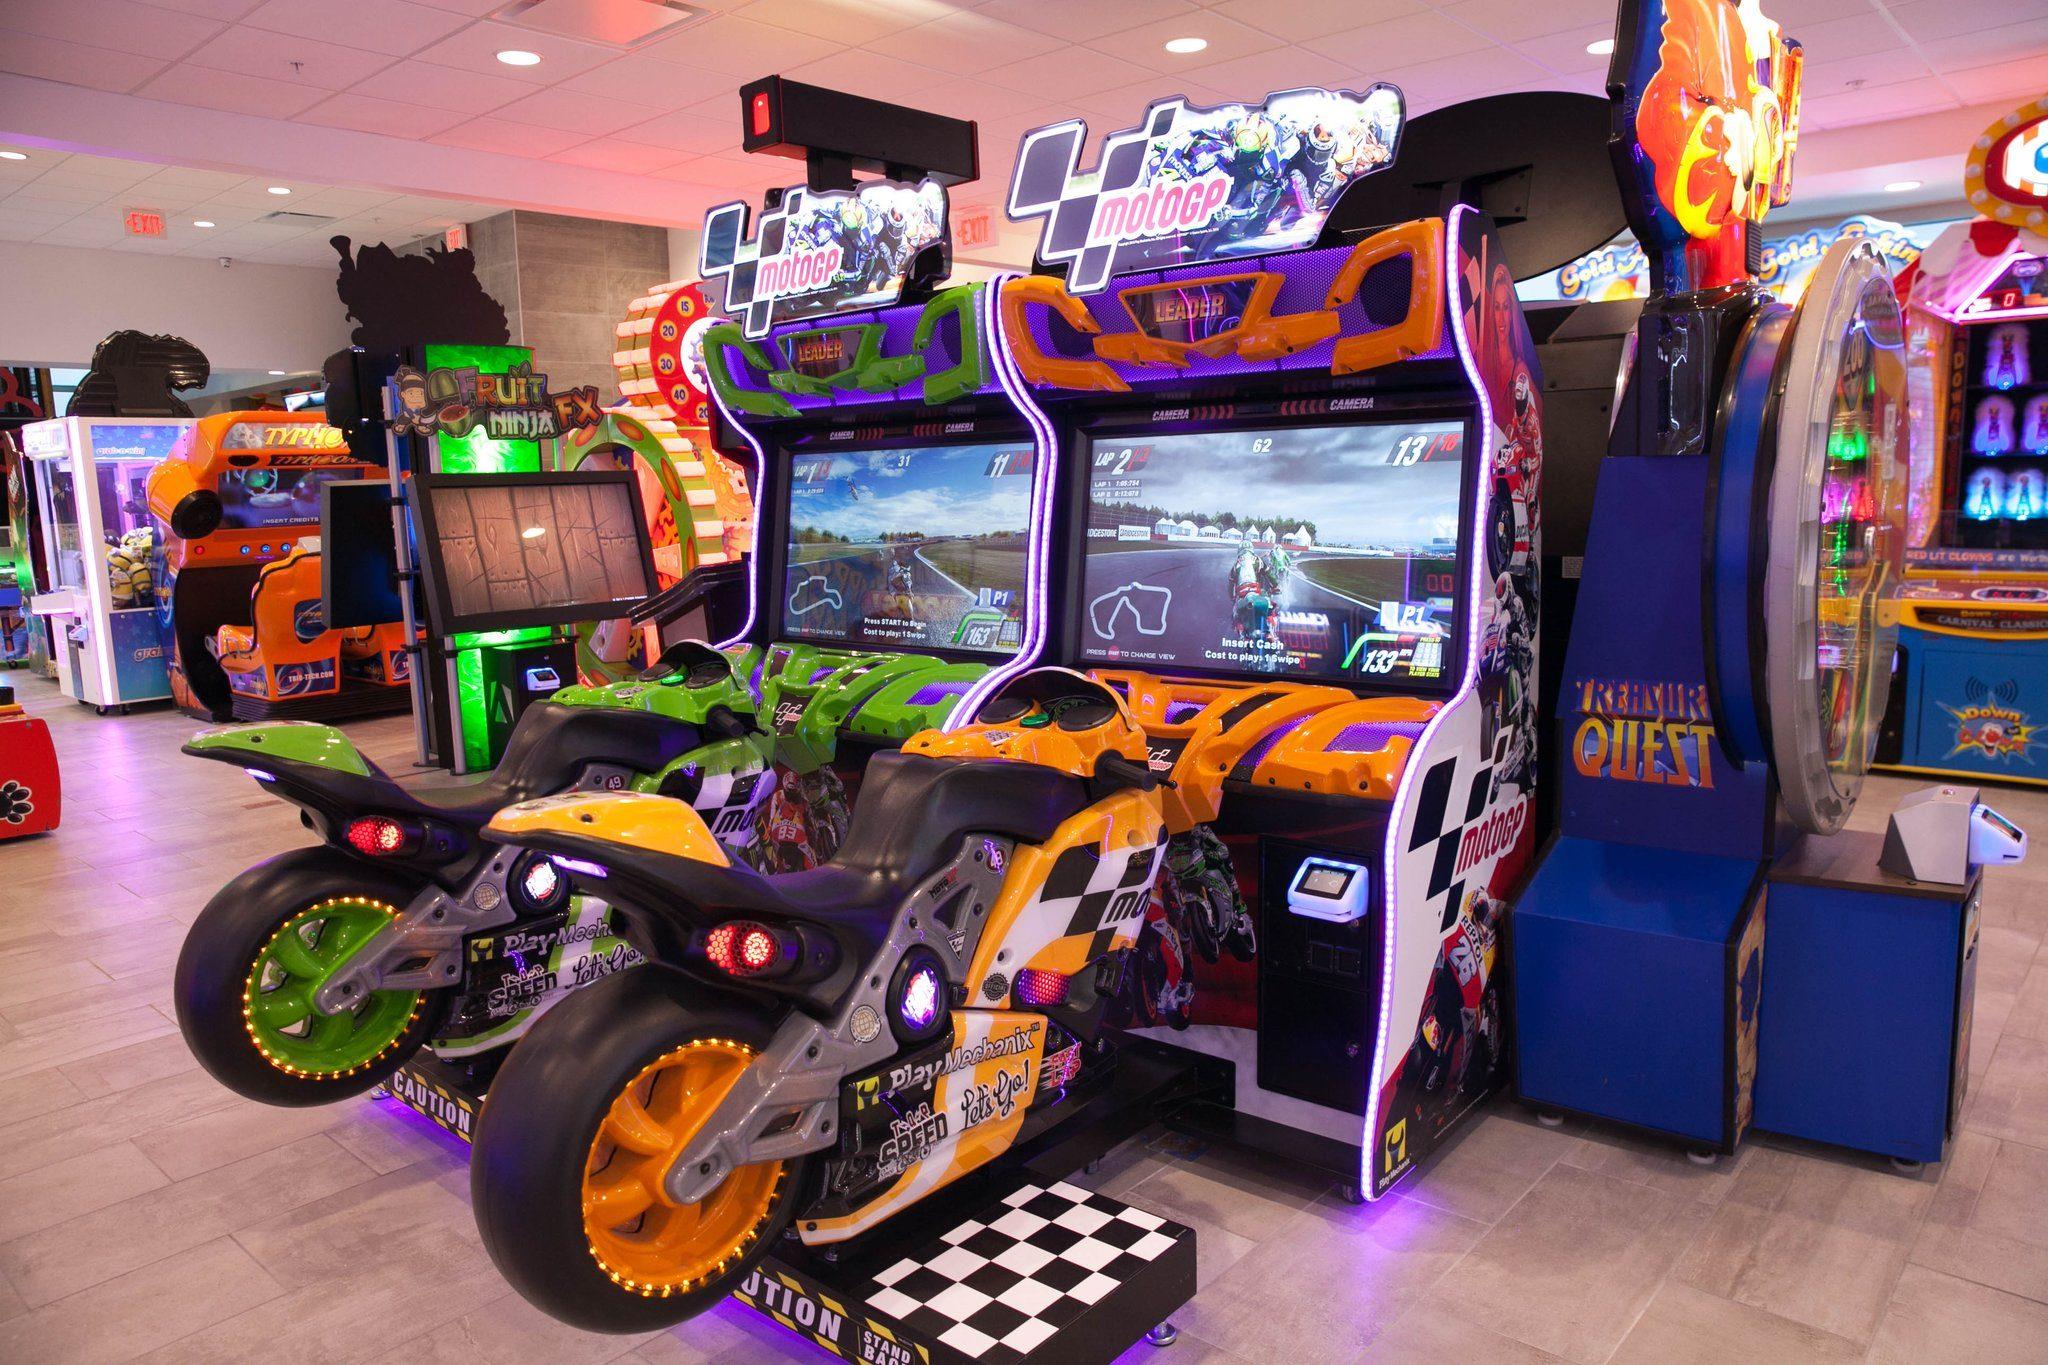 EpicMcD Orl games arcade McDonald's